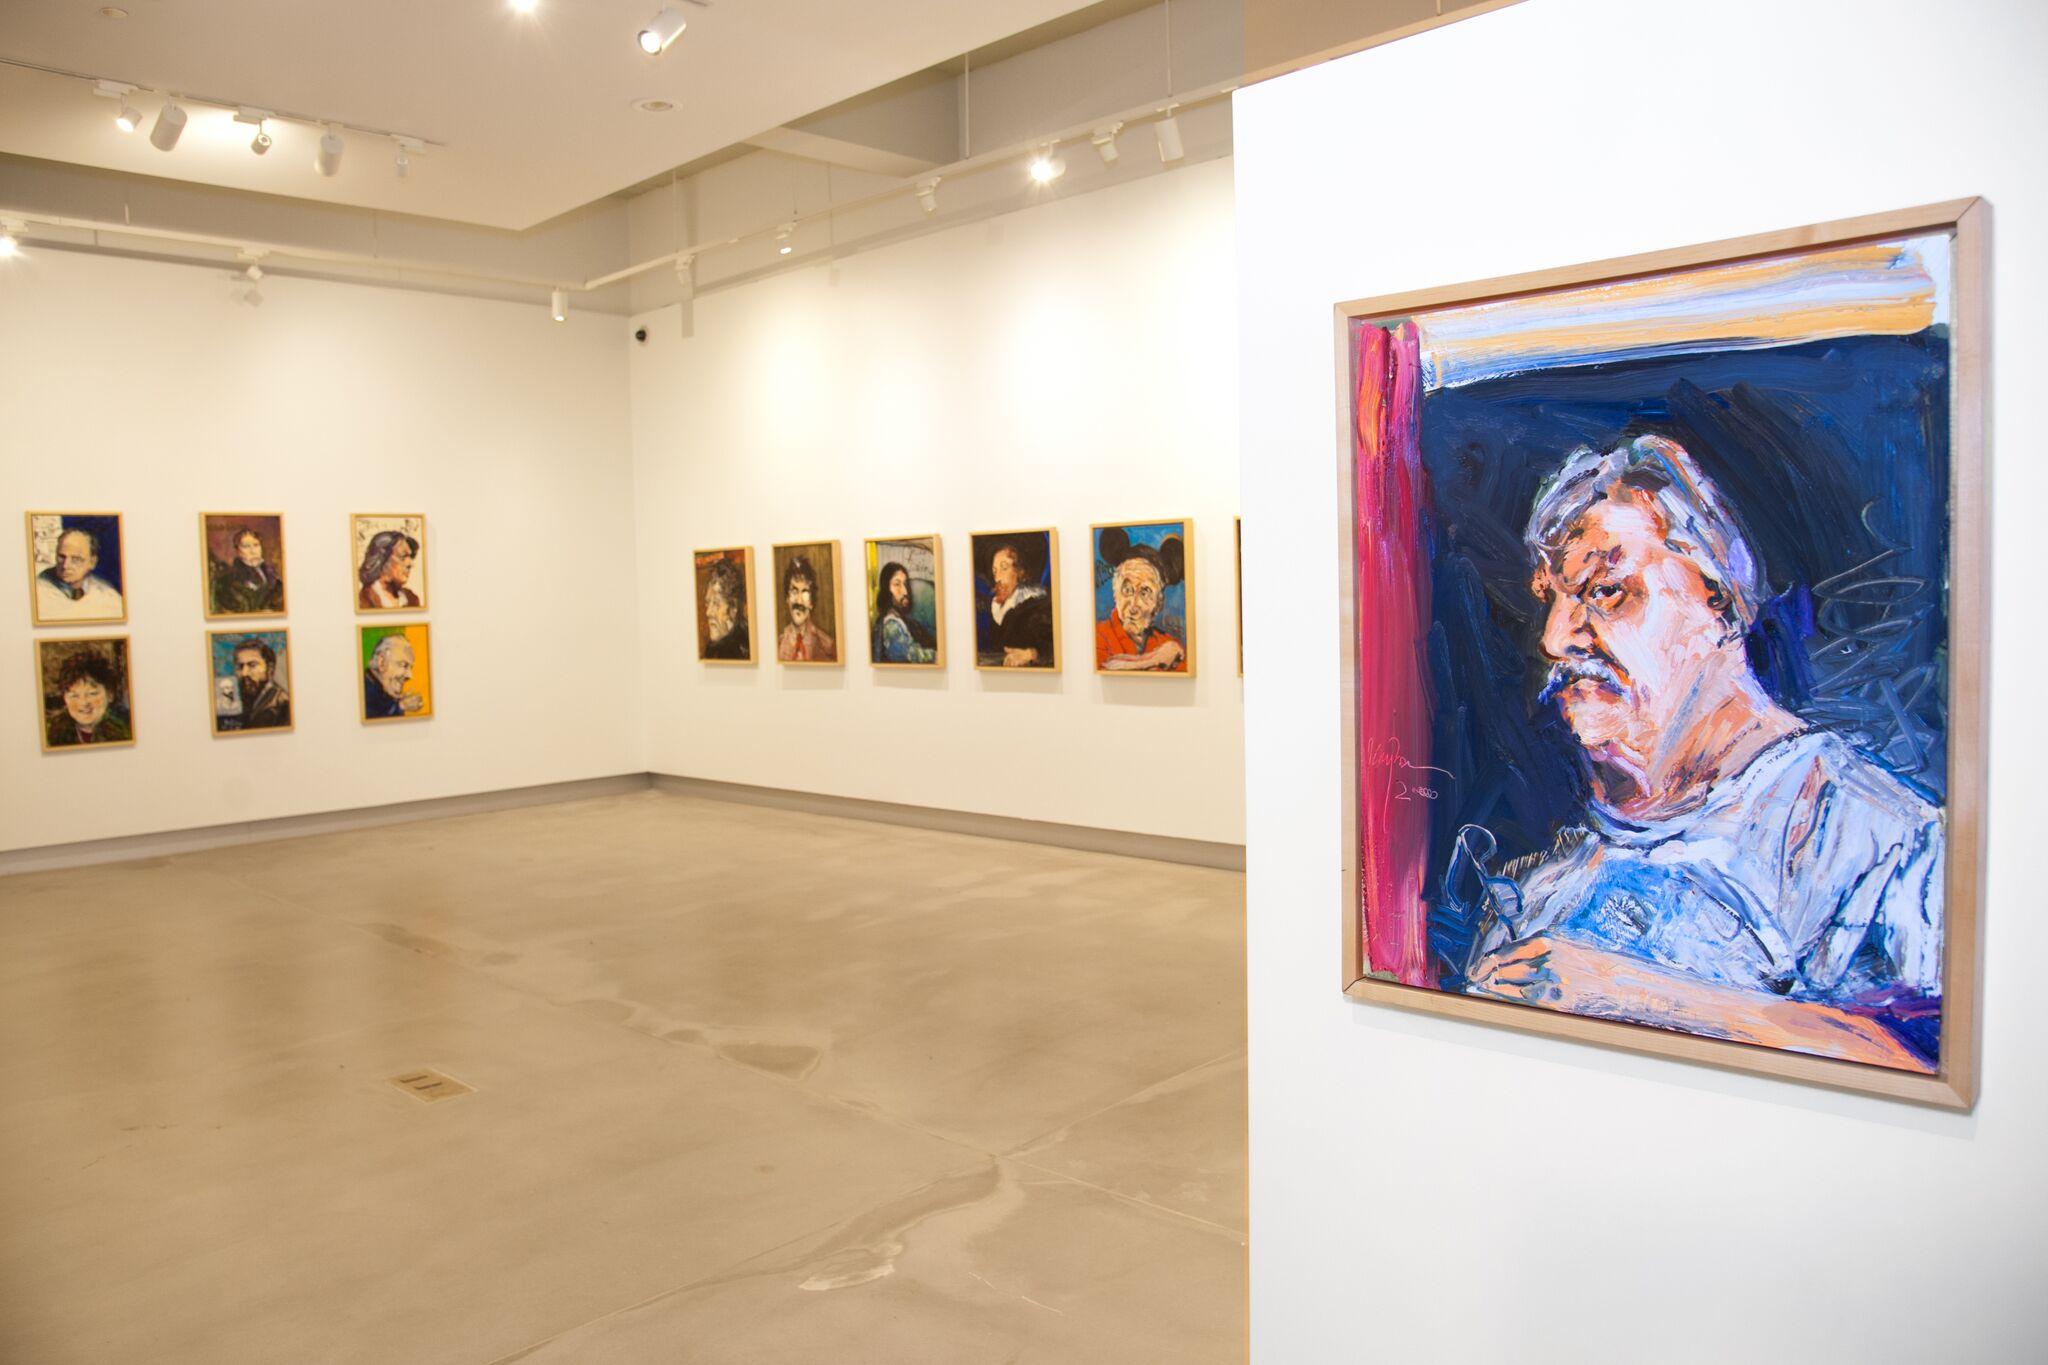 Through Gordon Rayner's Eyes: Portraits of Famous Artists (exhibition)